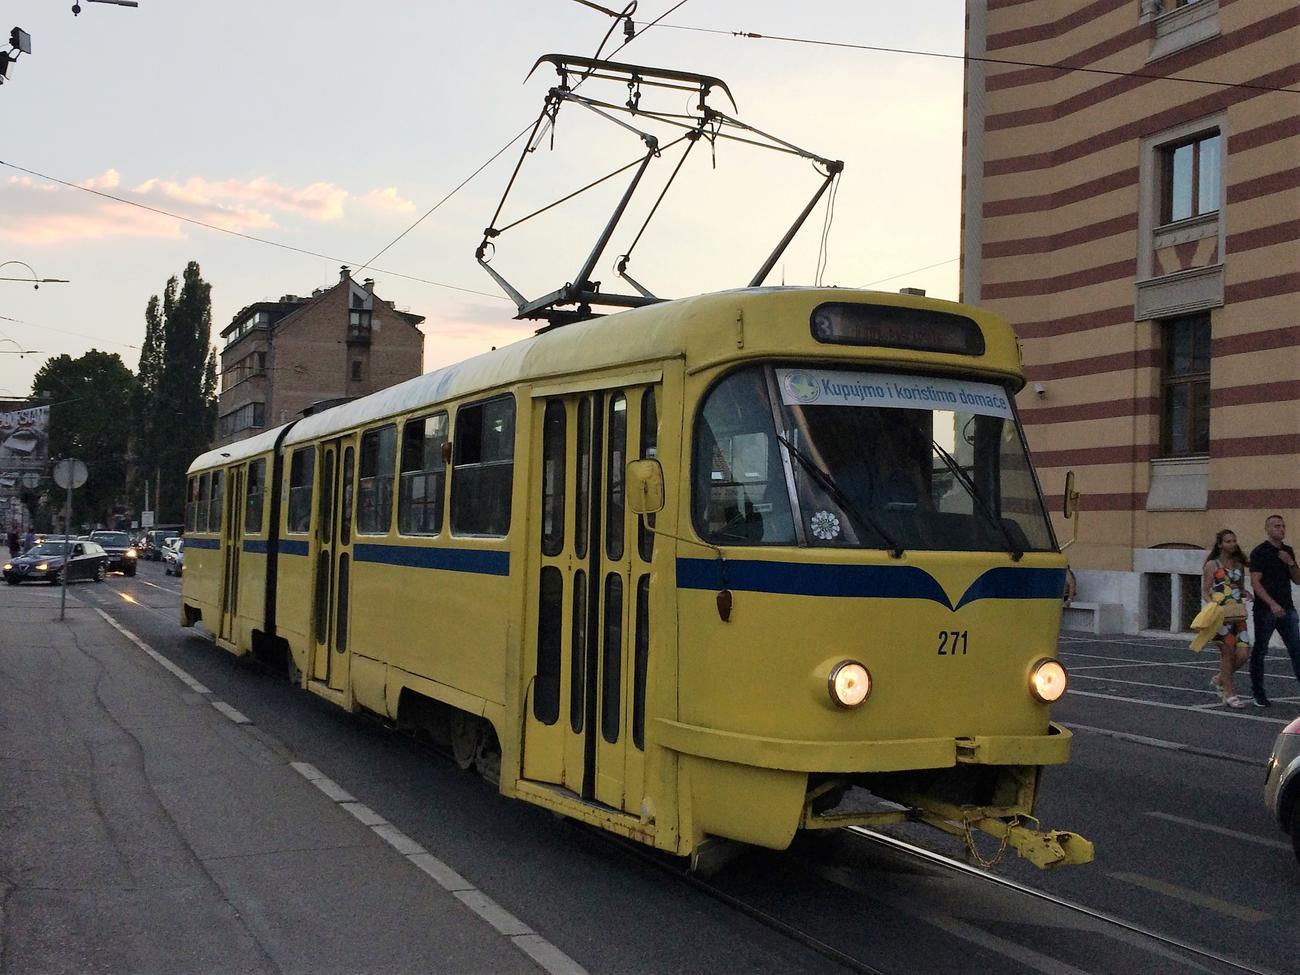 Sarajevo tram at dusk